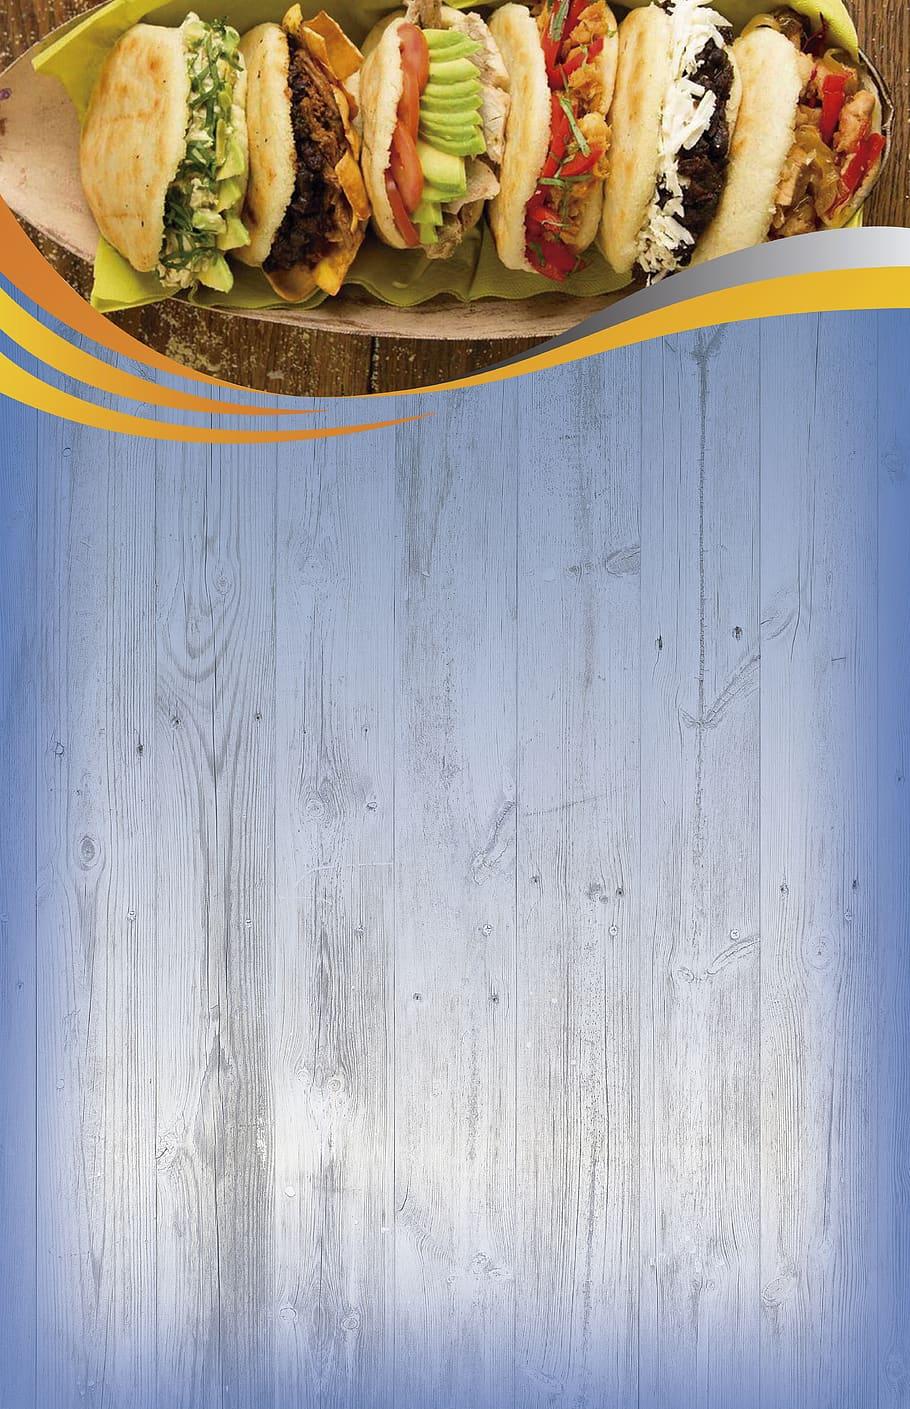 Background menu fast food